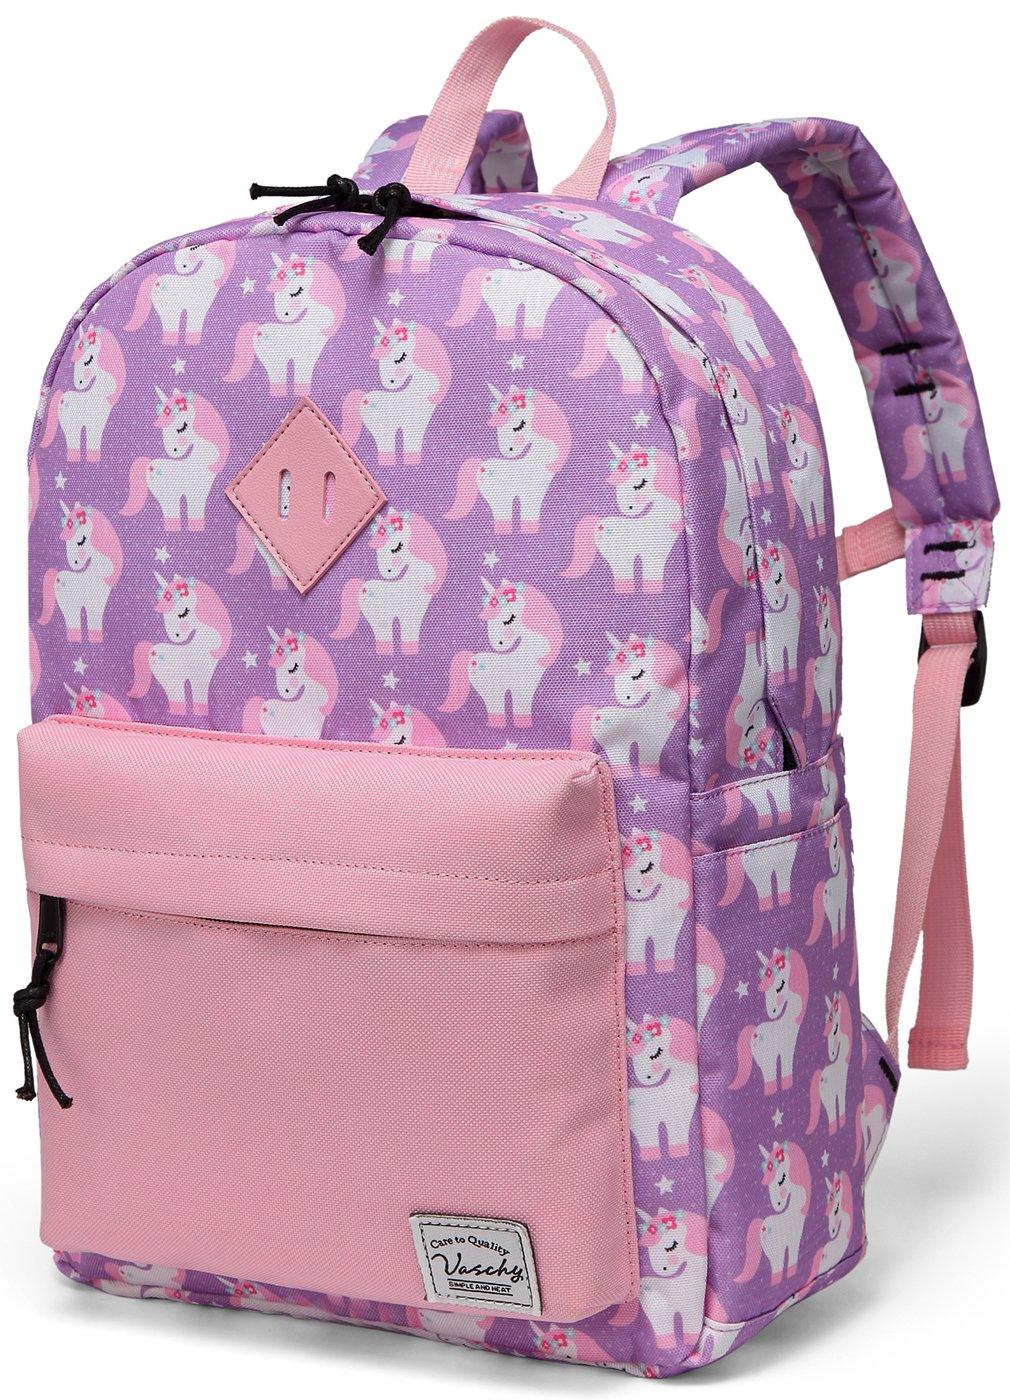 Backpack for Little Girls,Vaschy Preschool Backpacks for kindergarten with Chest Strap Pink Unicorn by VASCHY